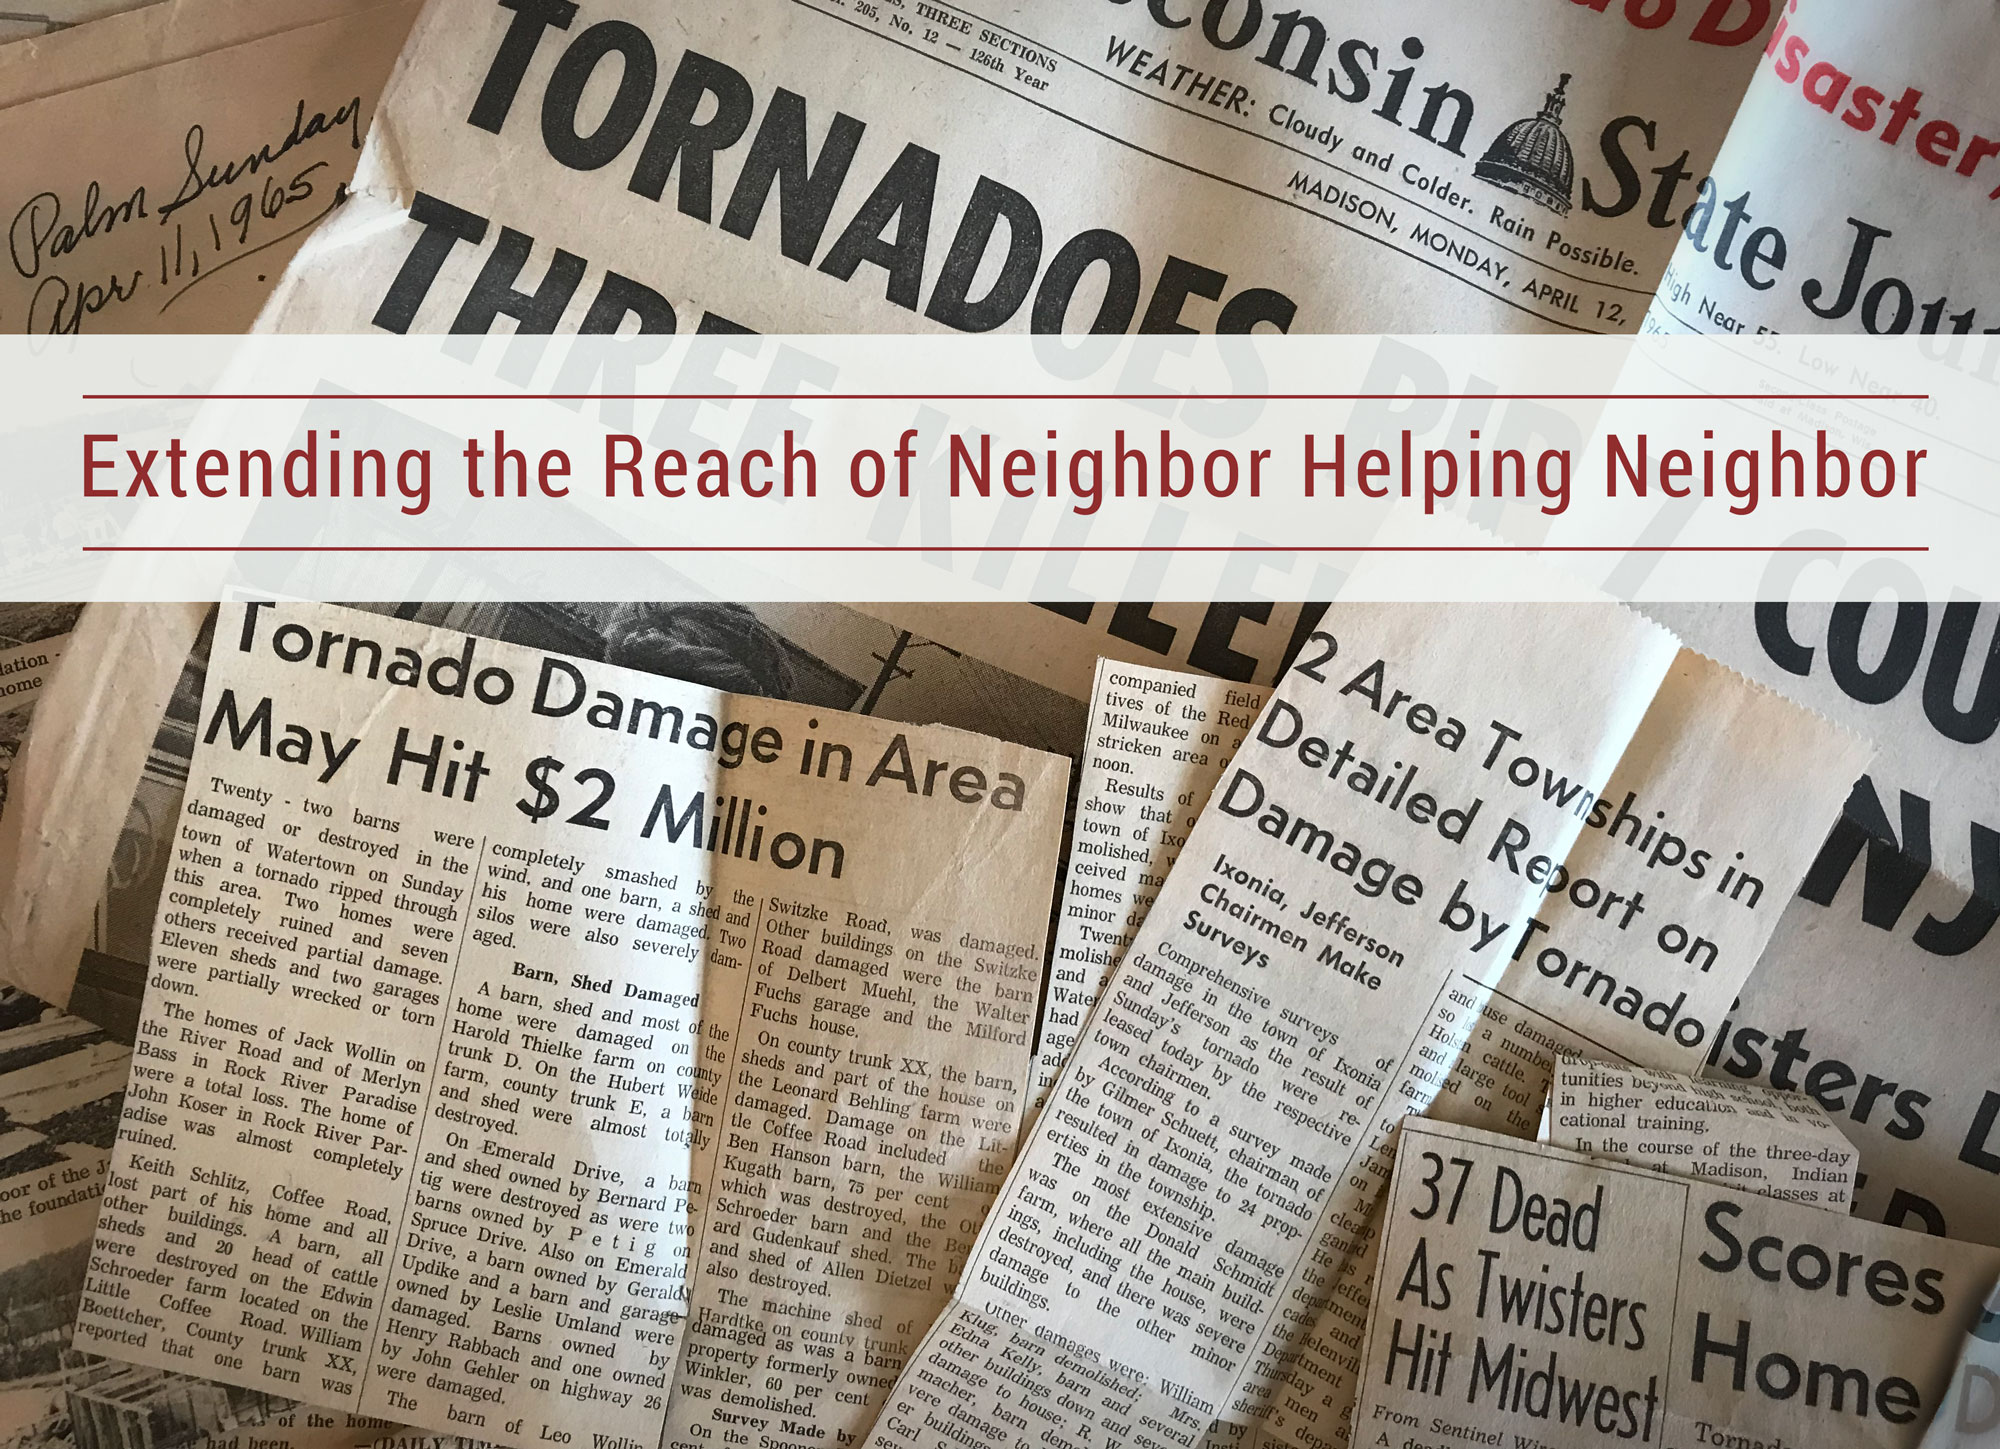 Newspaper clippings of 1965 Palm Sunday Tornado, Forward Mutual Insurance Company